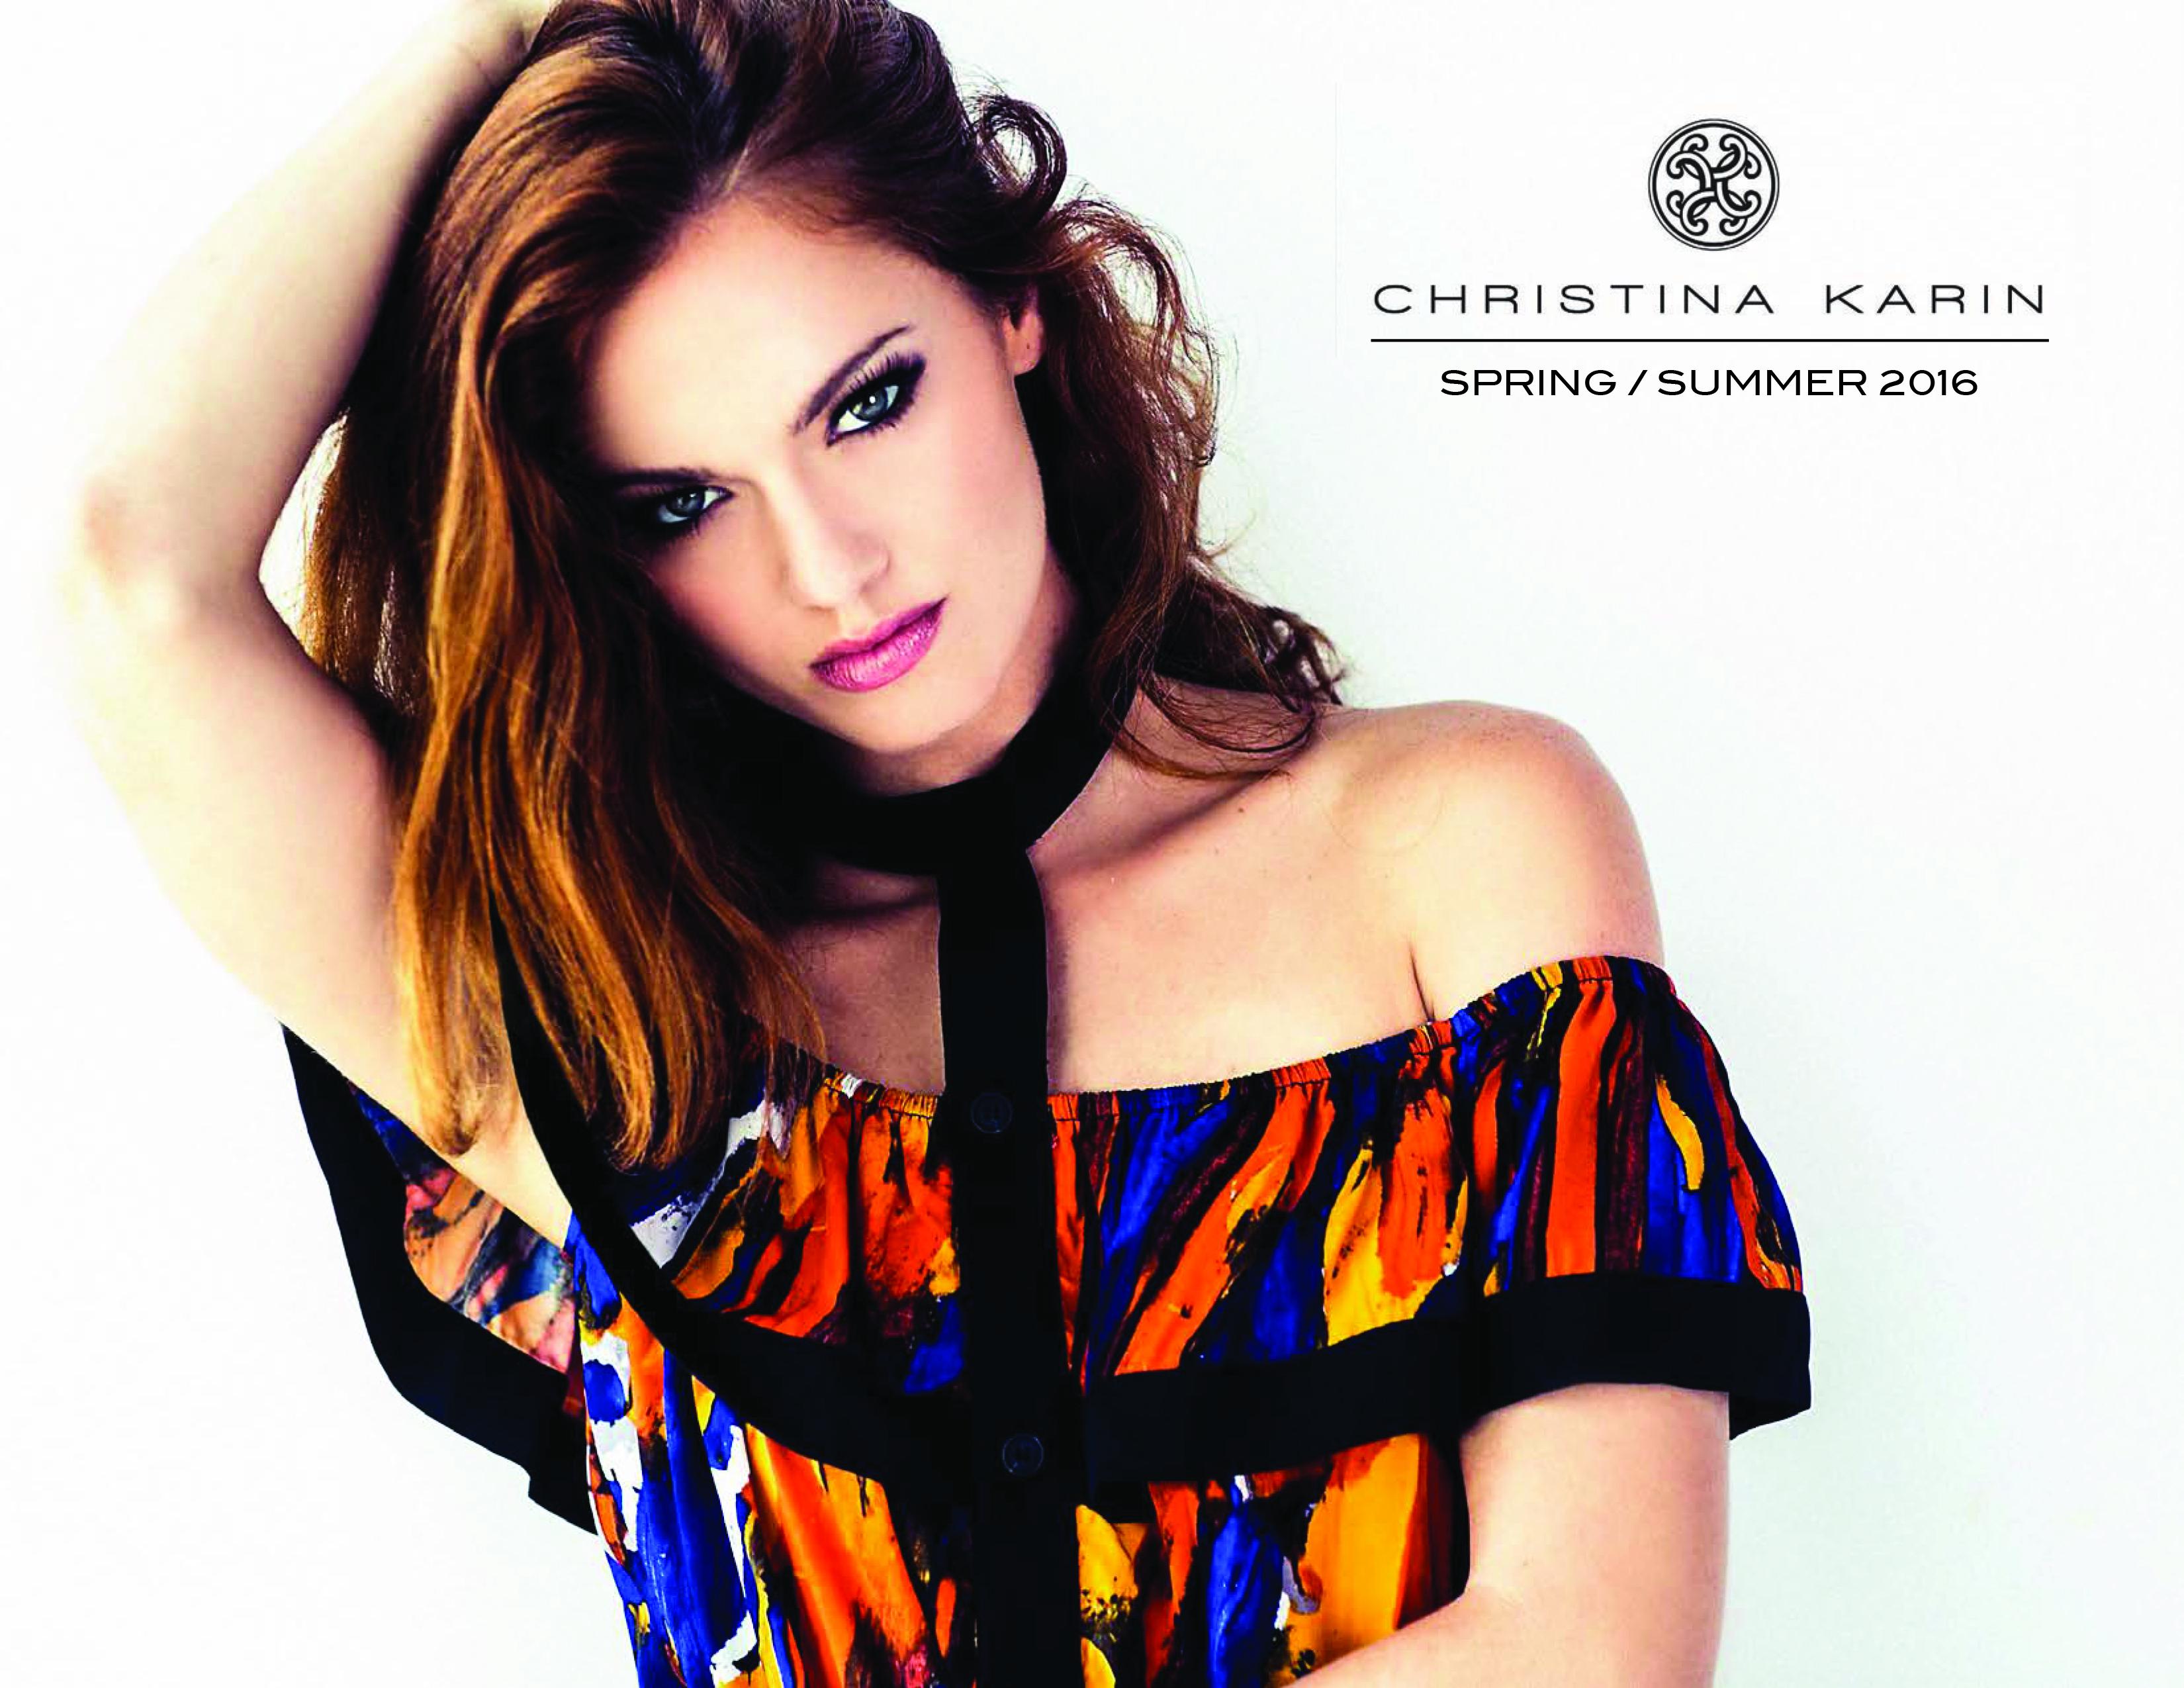 Christina Karin Spring Summer 2016